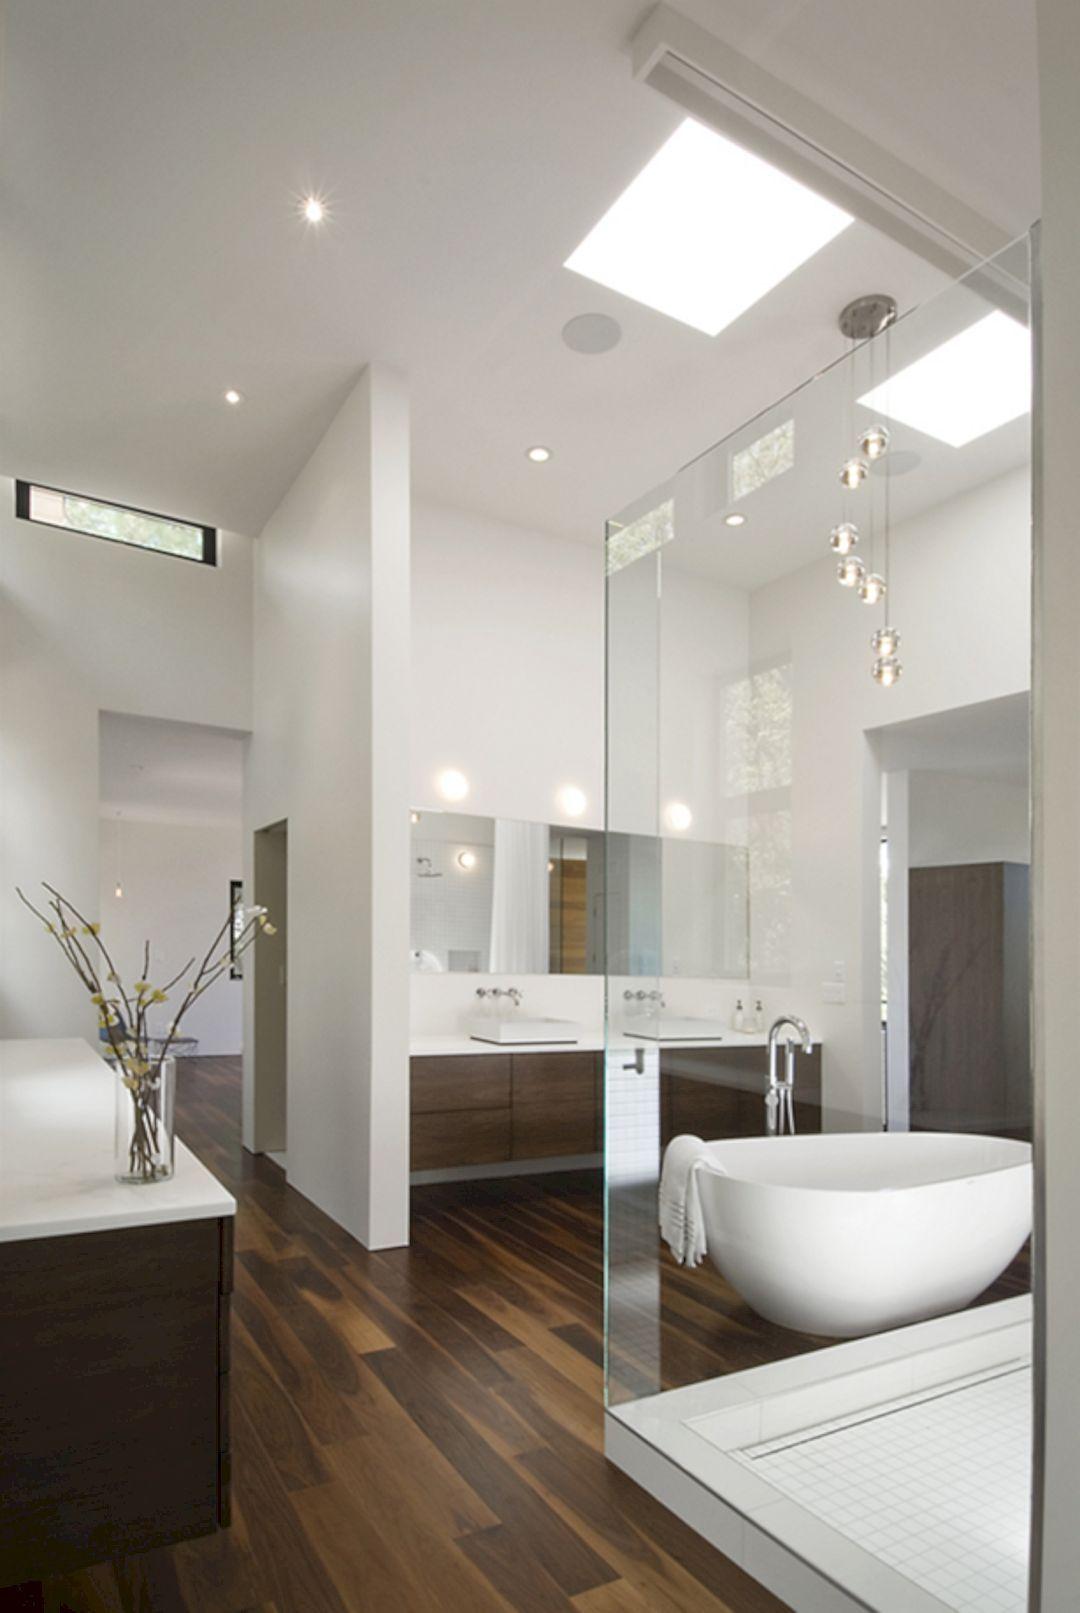 Stylish Modern Bathroom: 128 Best Designs Roundup | Pinterest ...